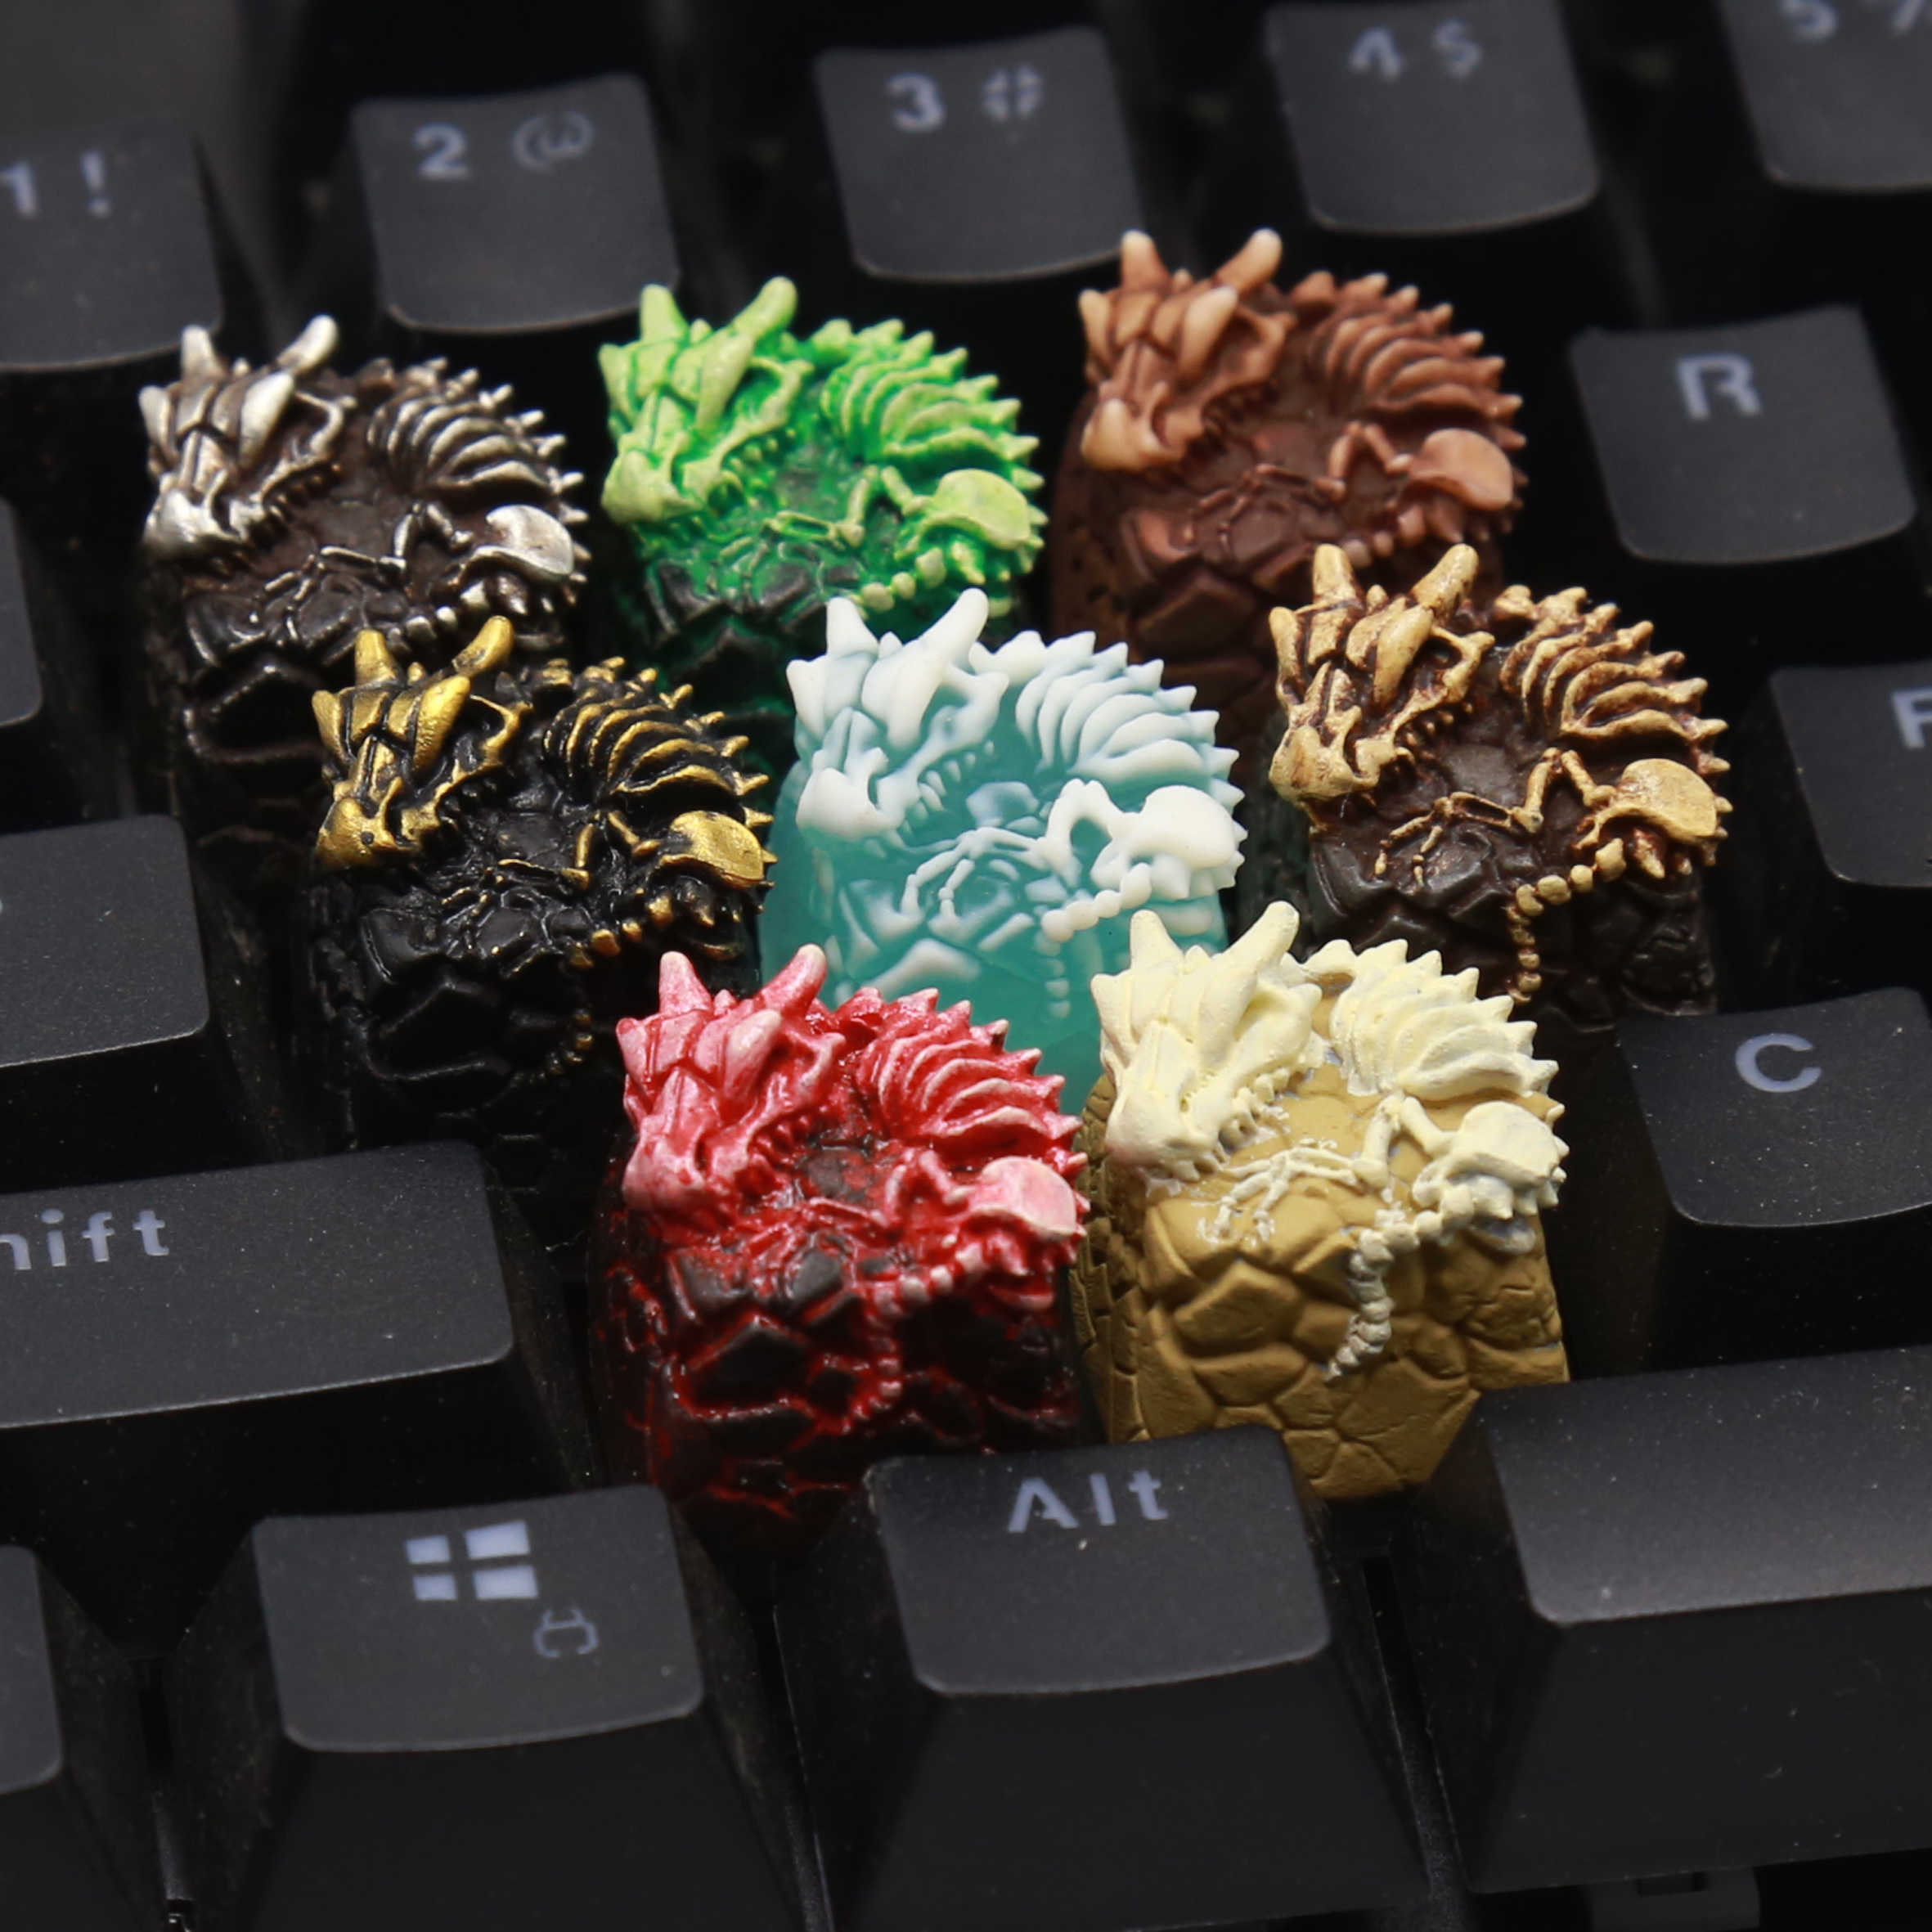 Handmade Key Cap Keyboard Decoration. Mechanical Keyboard Accessories Key Cap 1pc Resin Key Cap Personalized Key Cap Cherry Key Cap